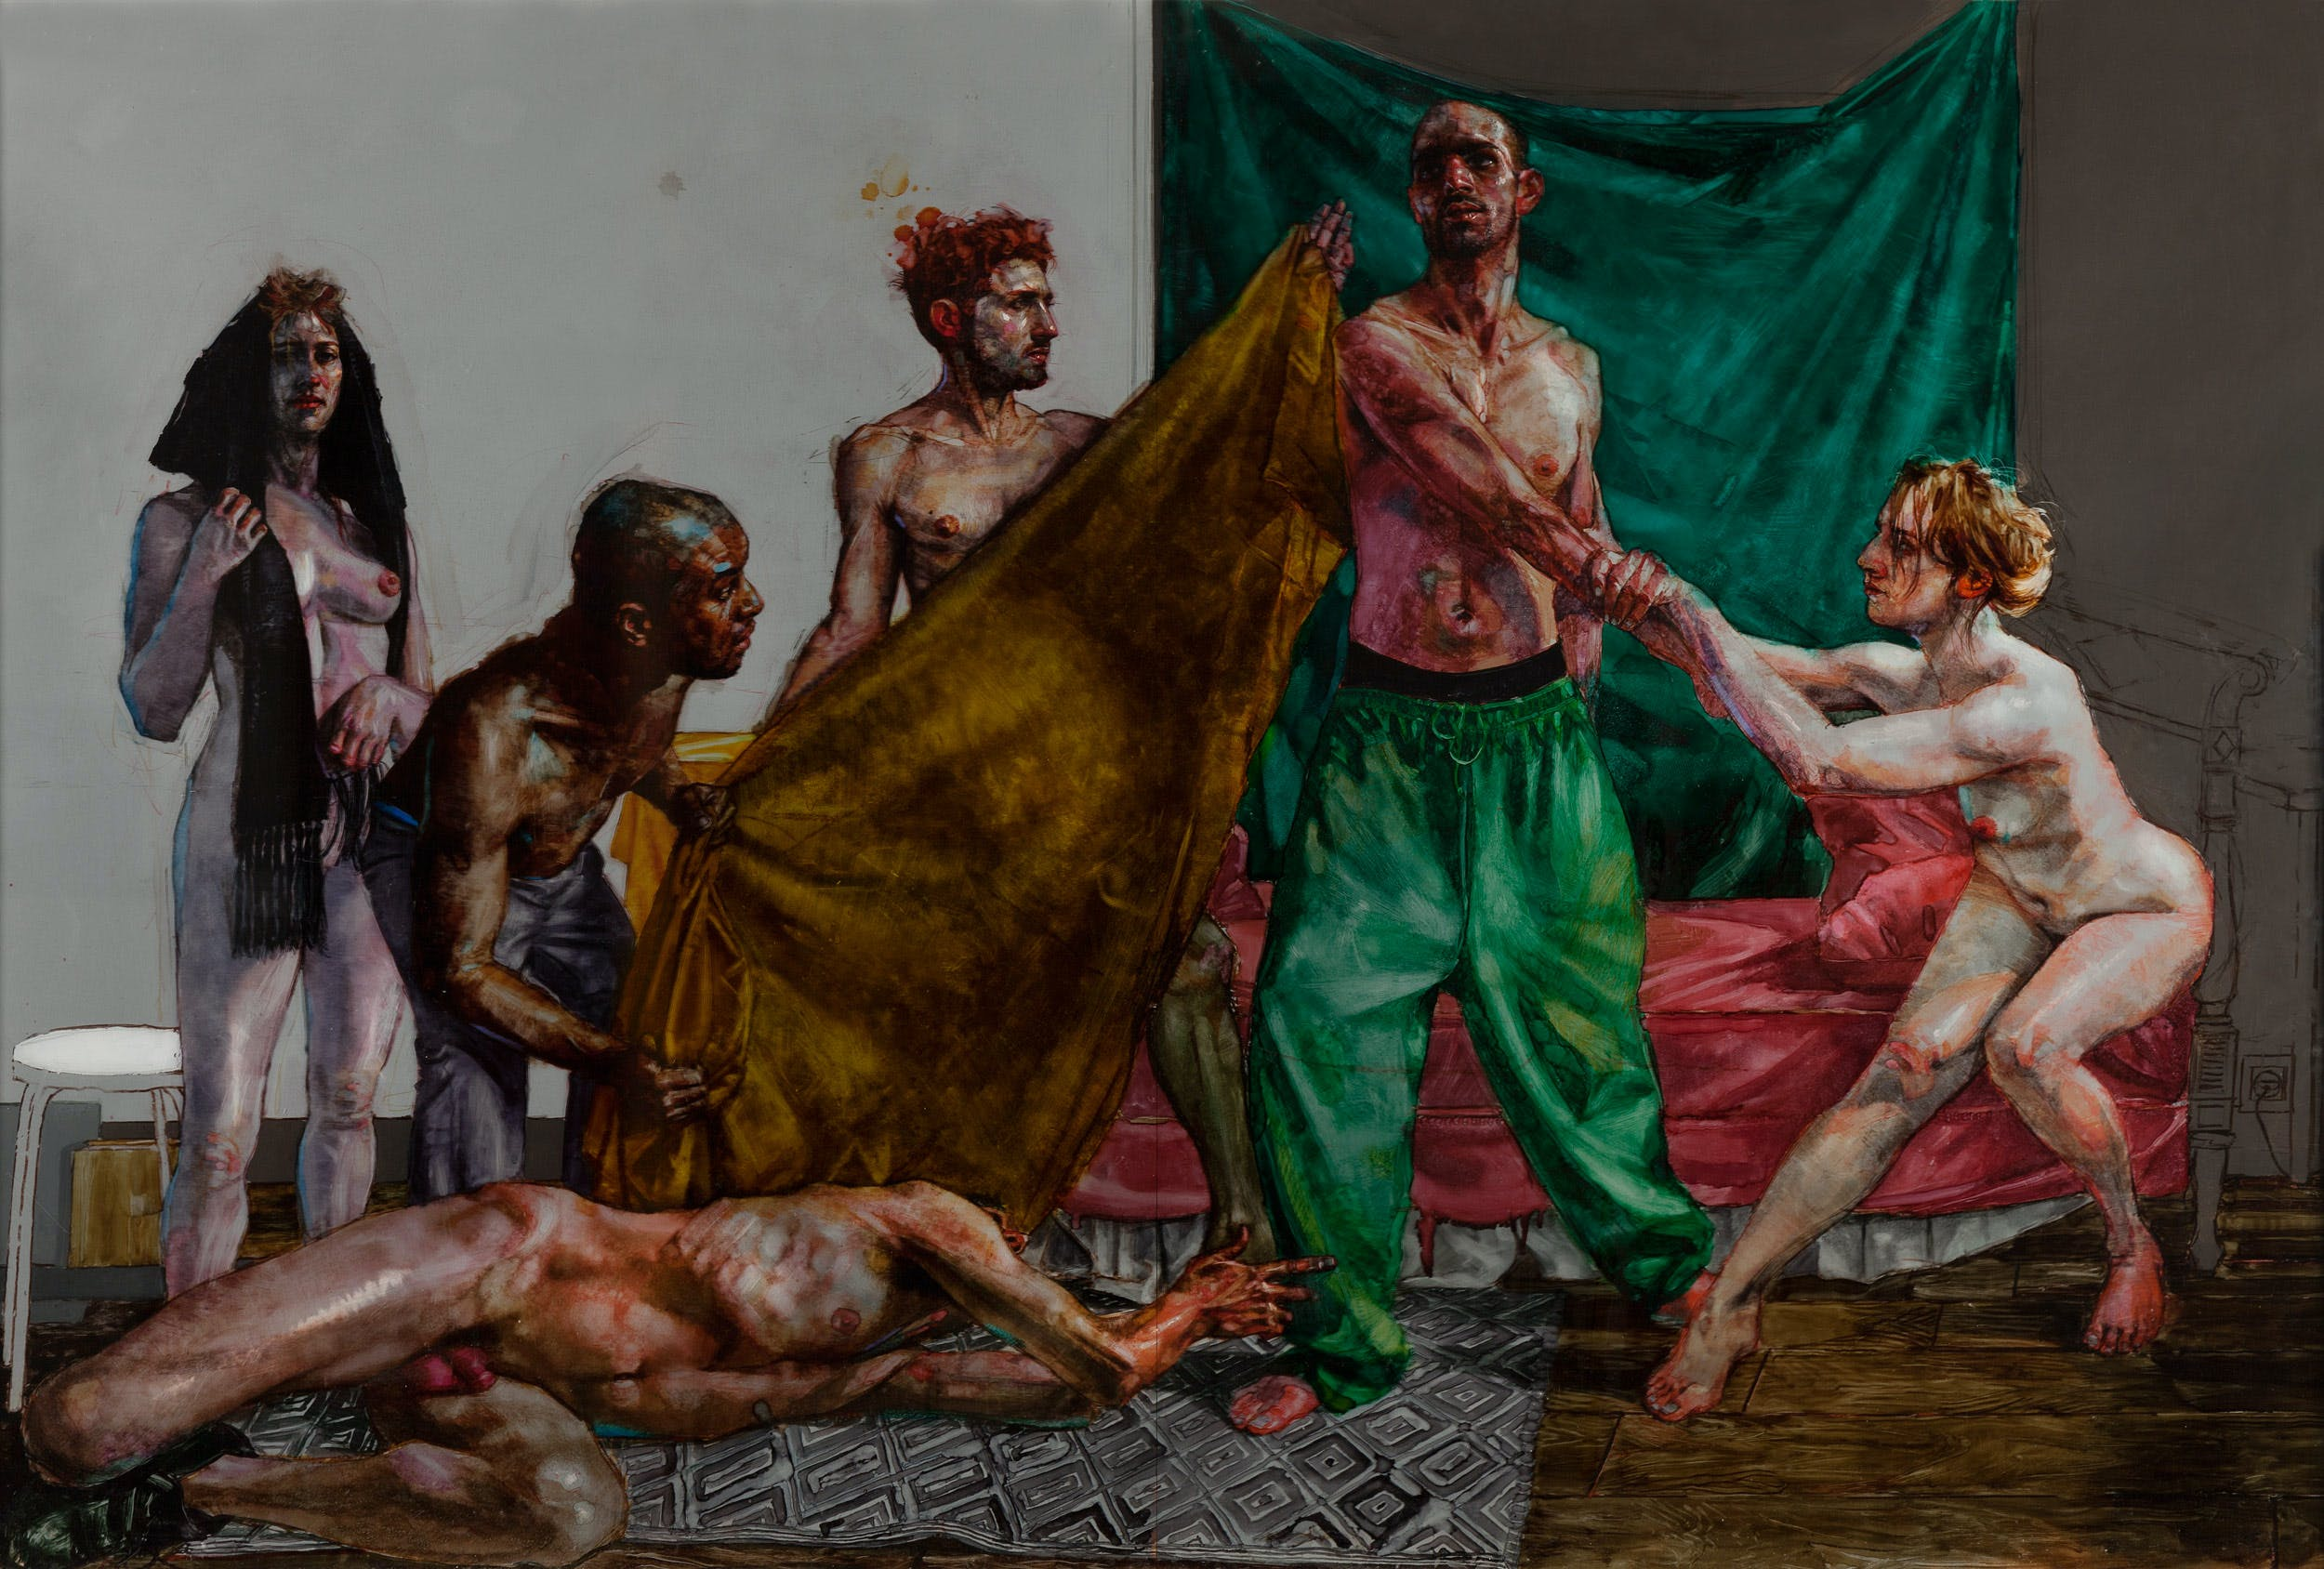 H Craig Hanna: Arrangement of Dancers